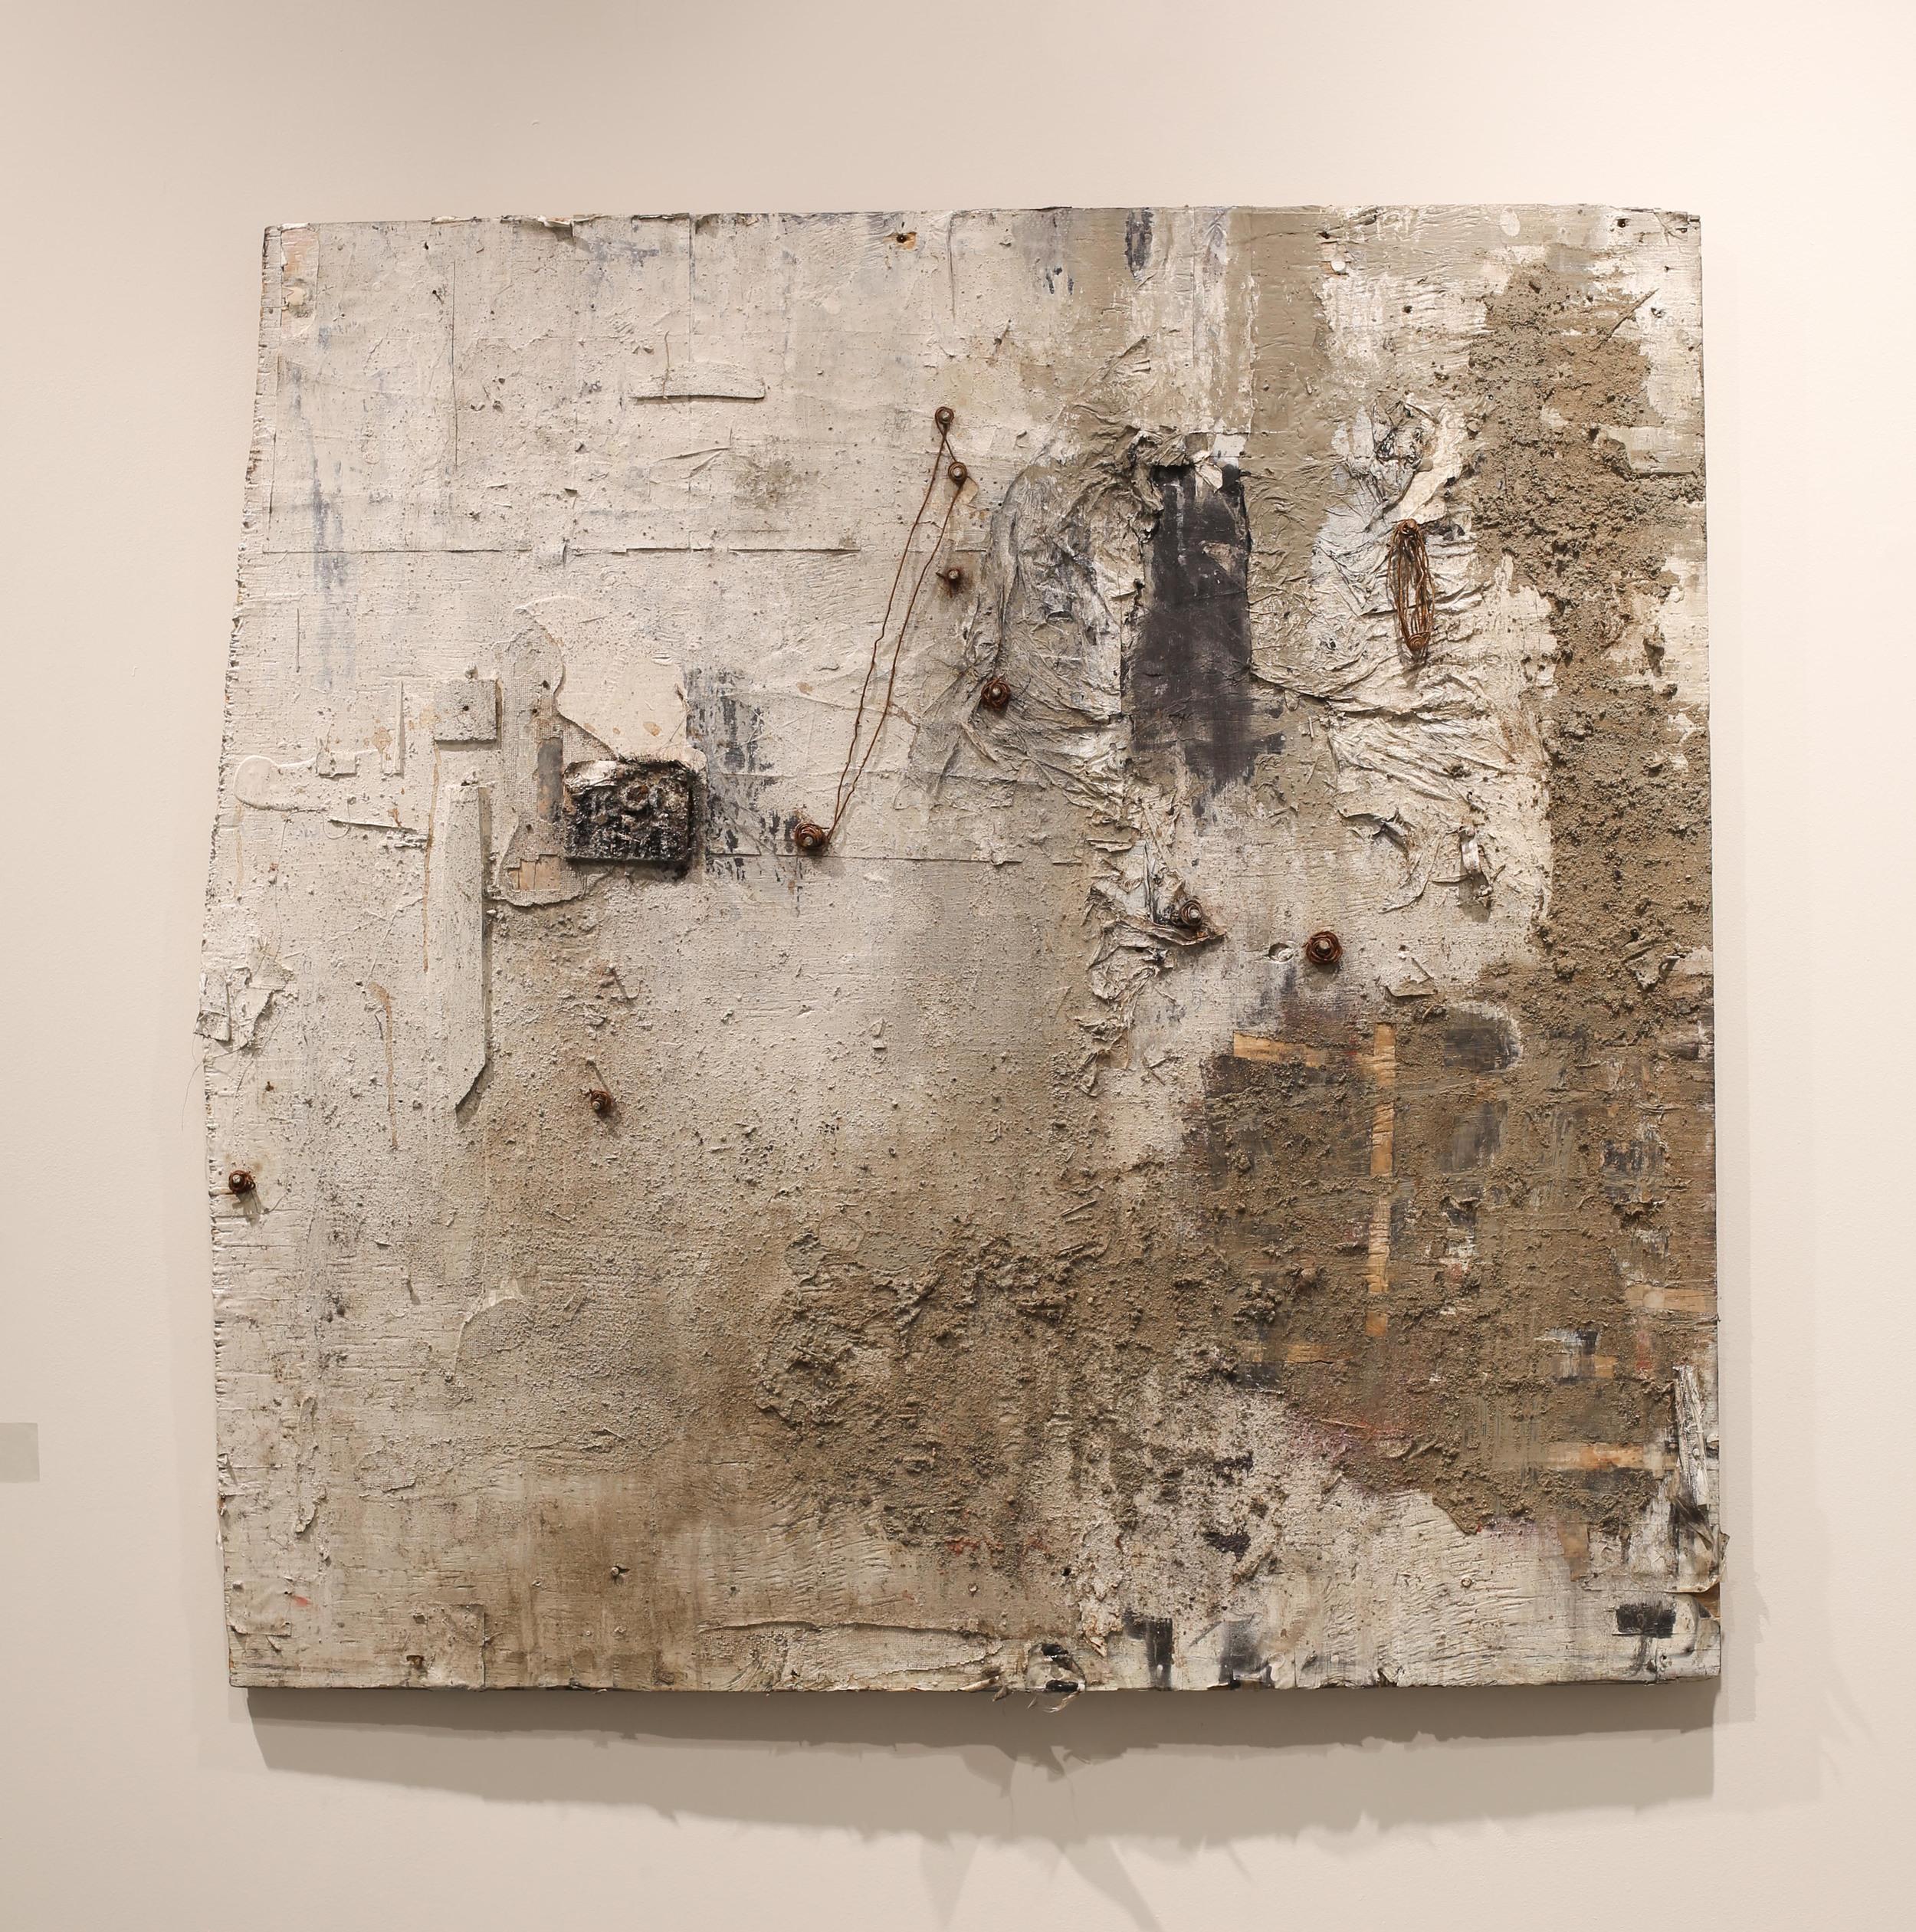 Sediment, 2015